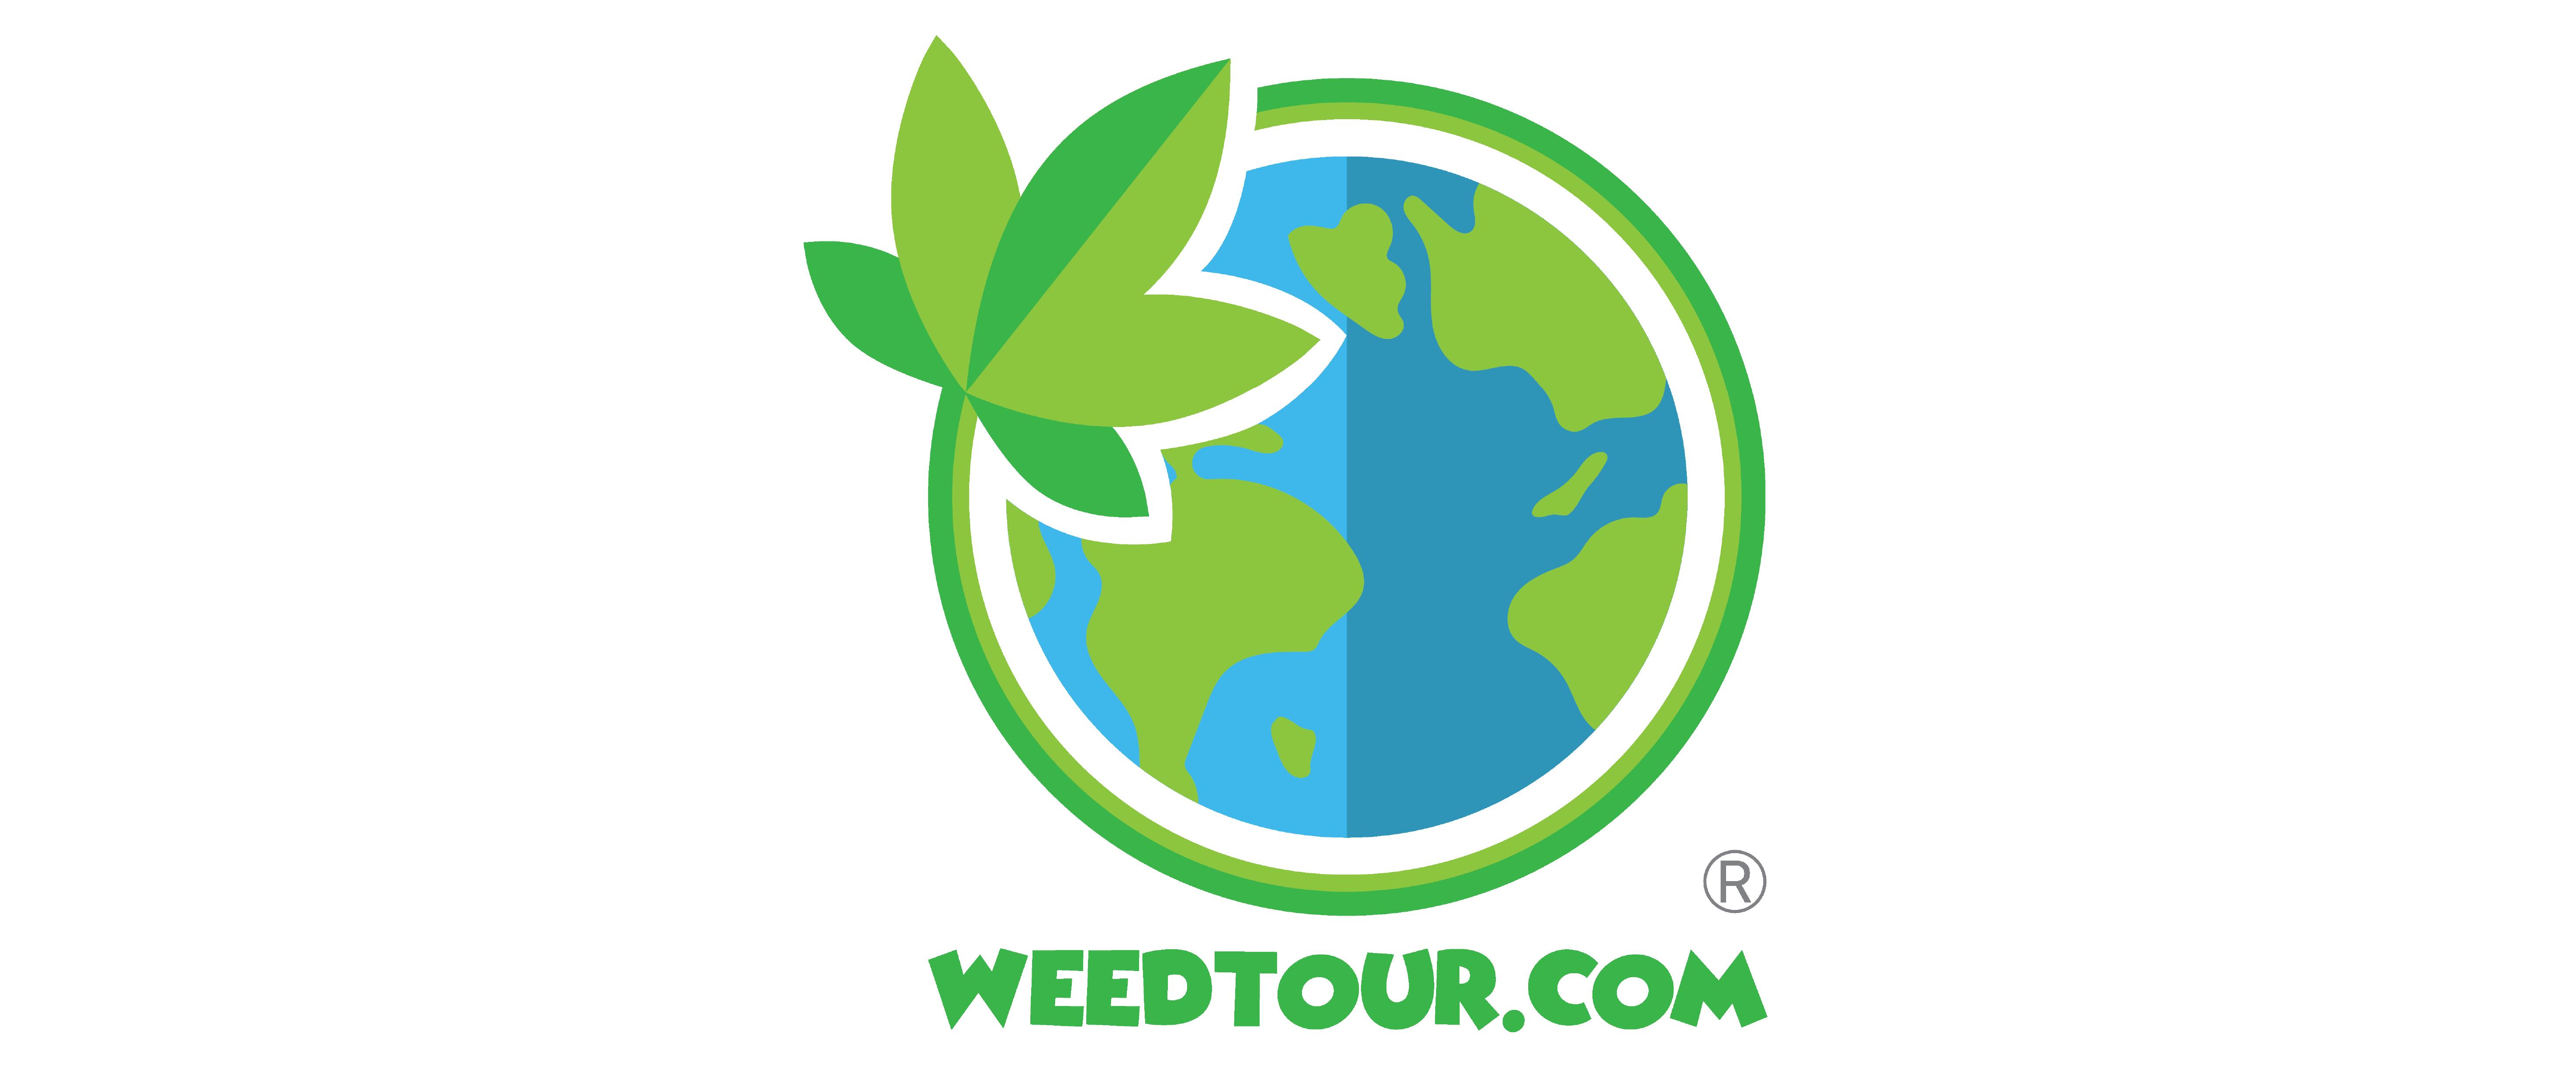 Weedtour | Weed Girls